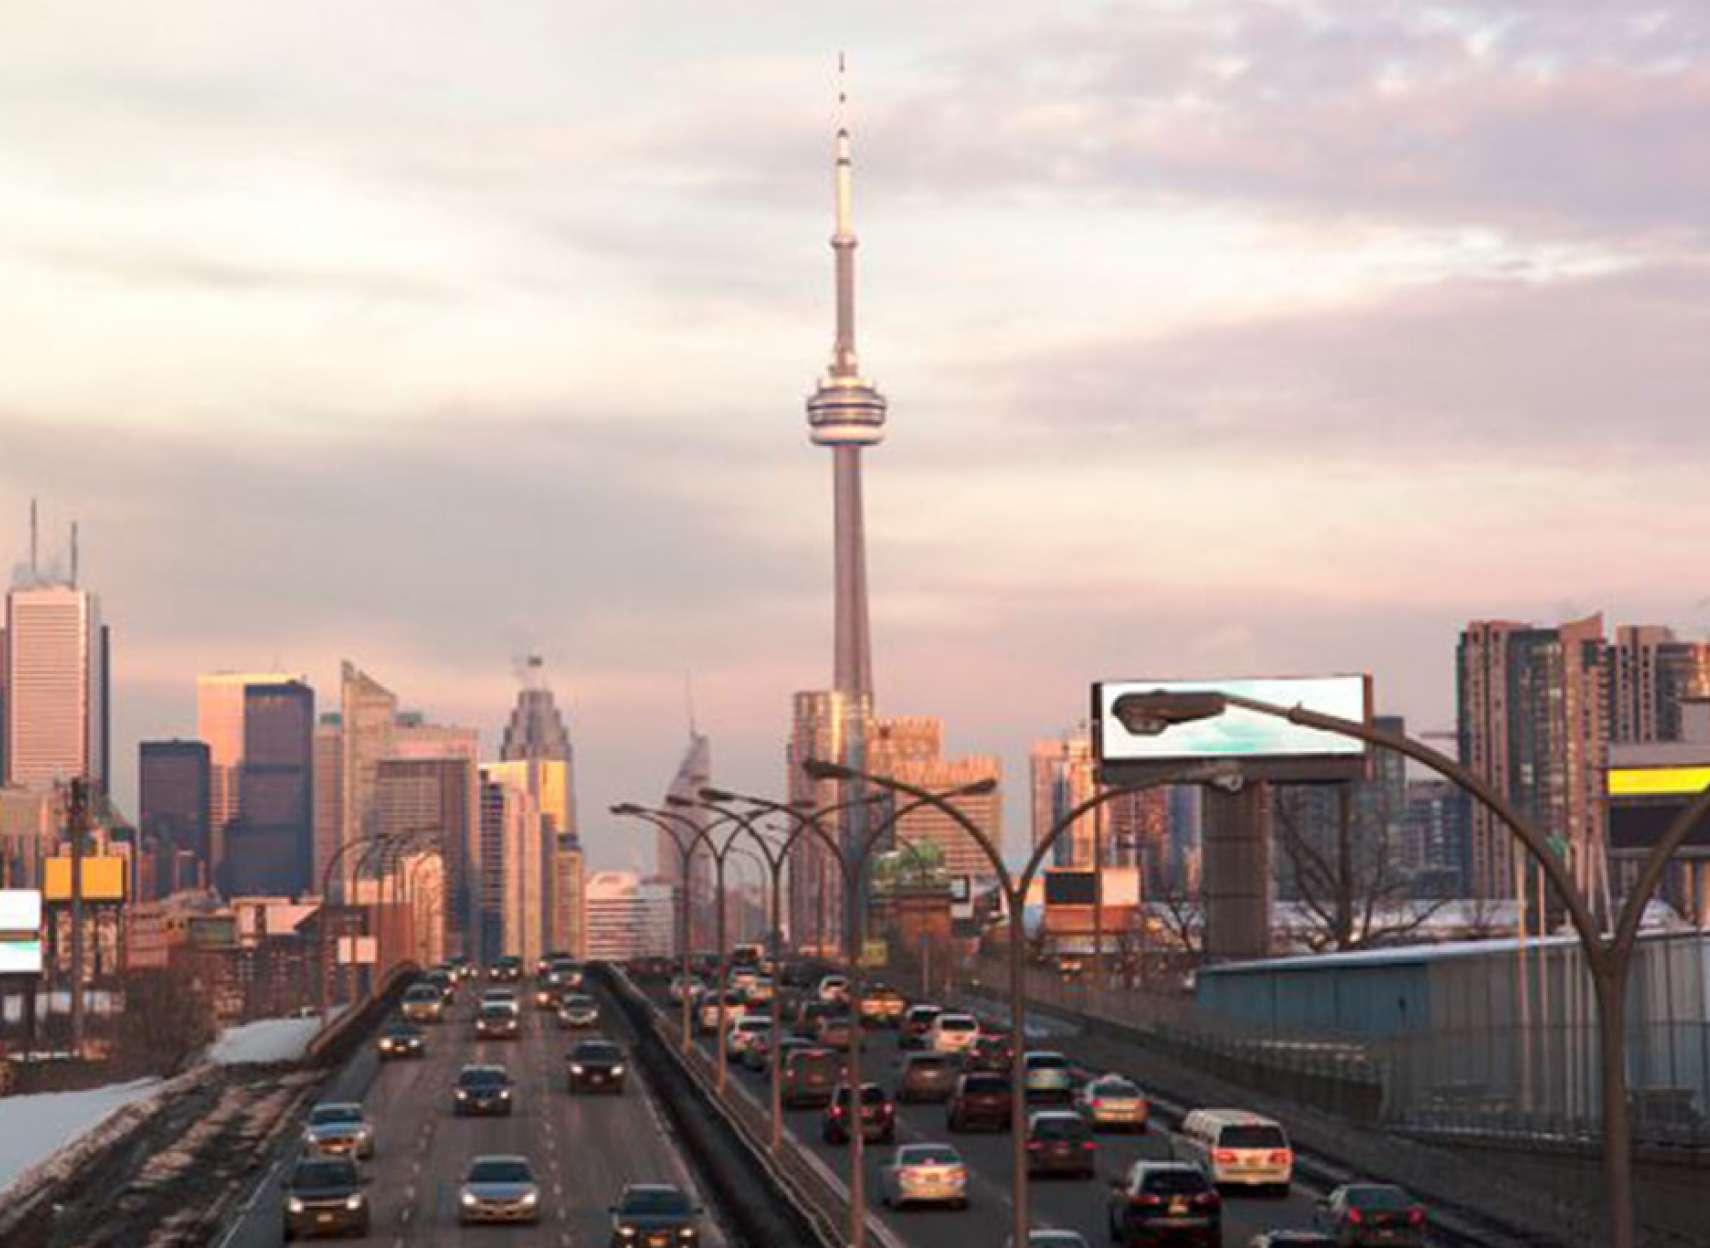 تورنتو-پُر-رشدترین-شهر-کانادا-و-آمریکا-شد-کانادا-اخبار